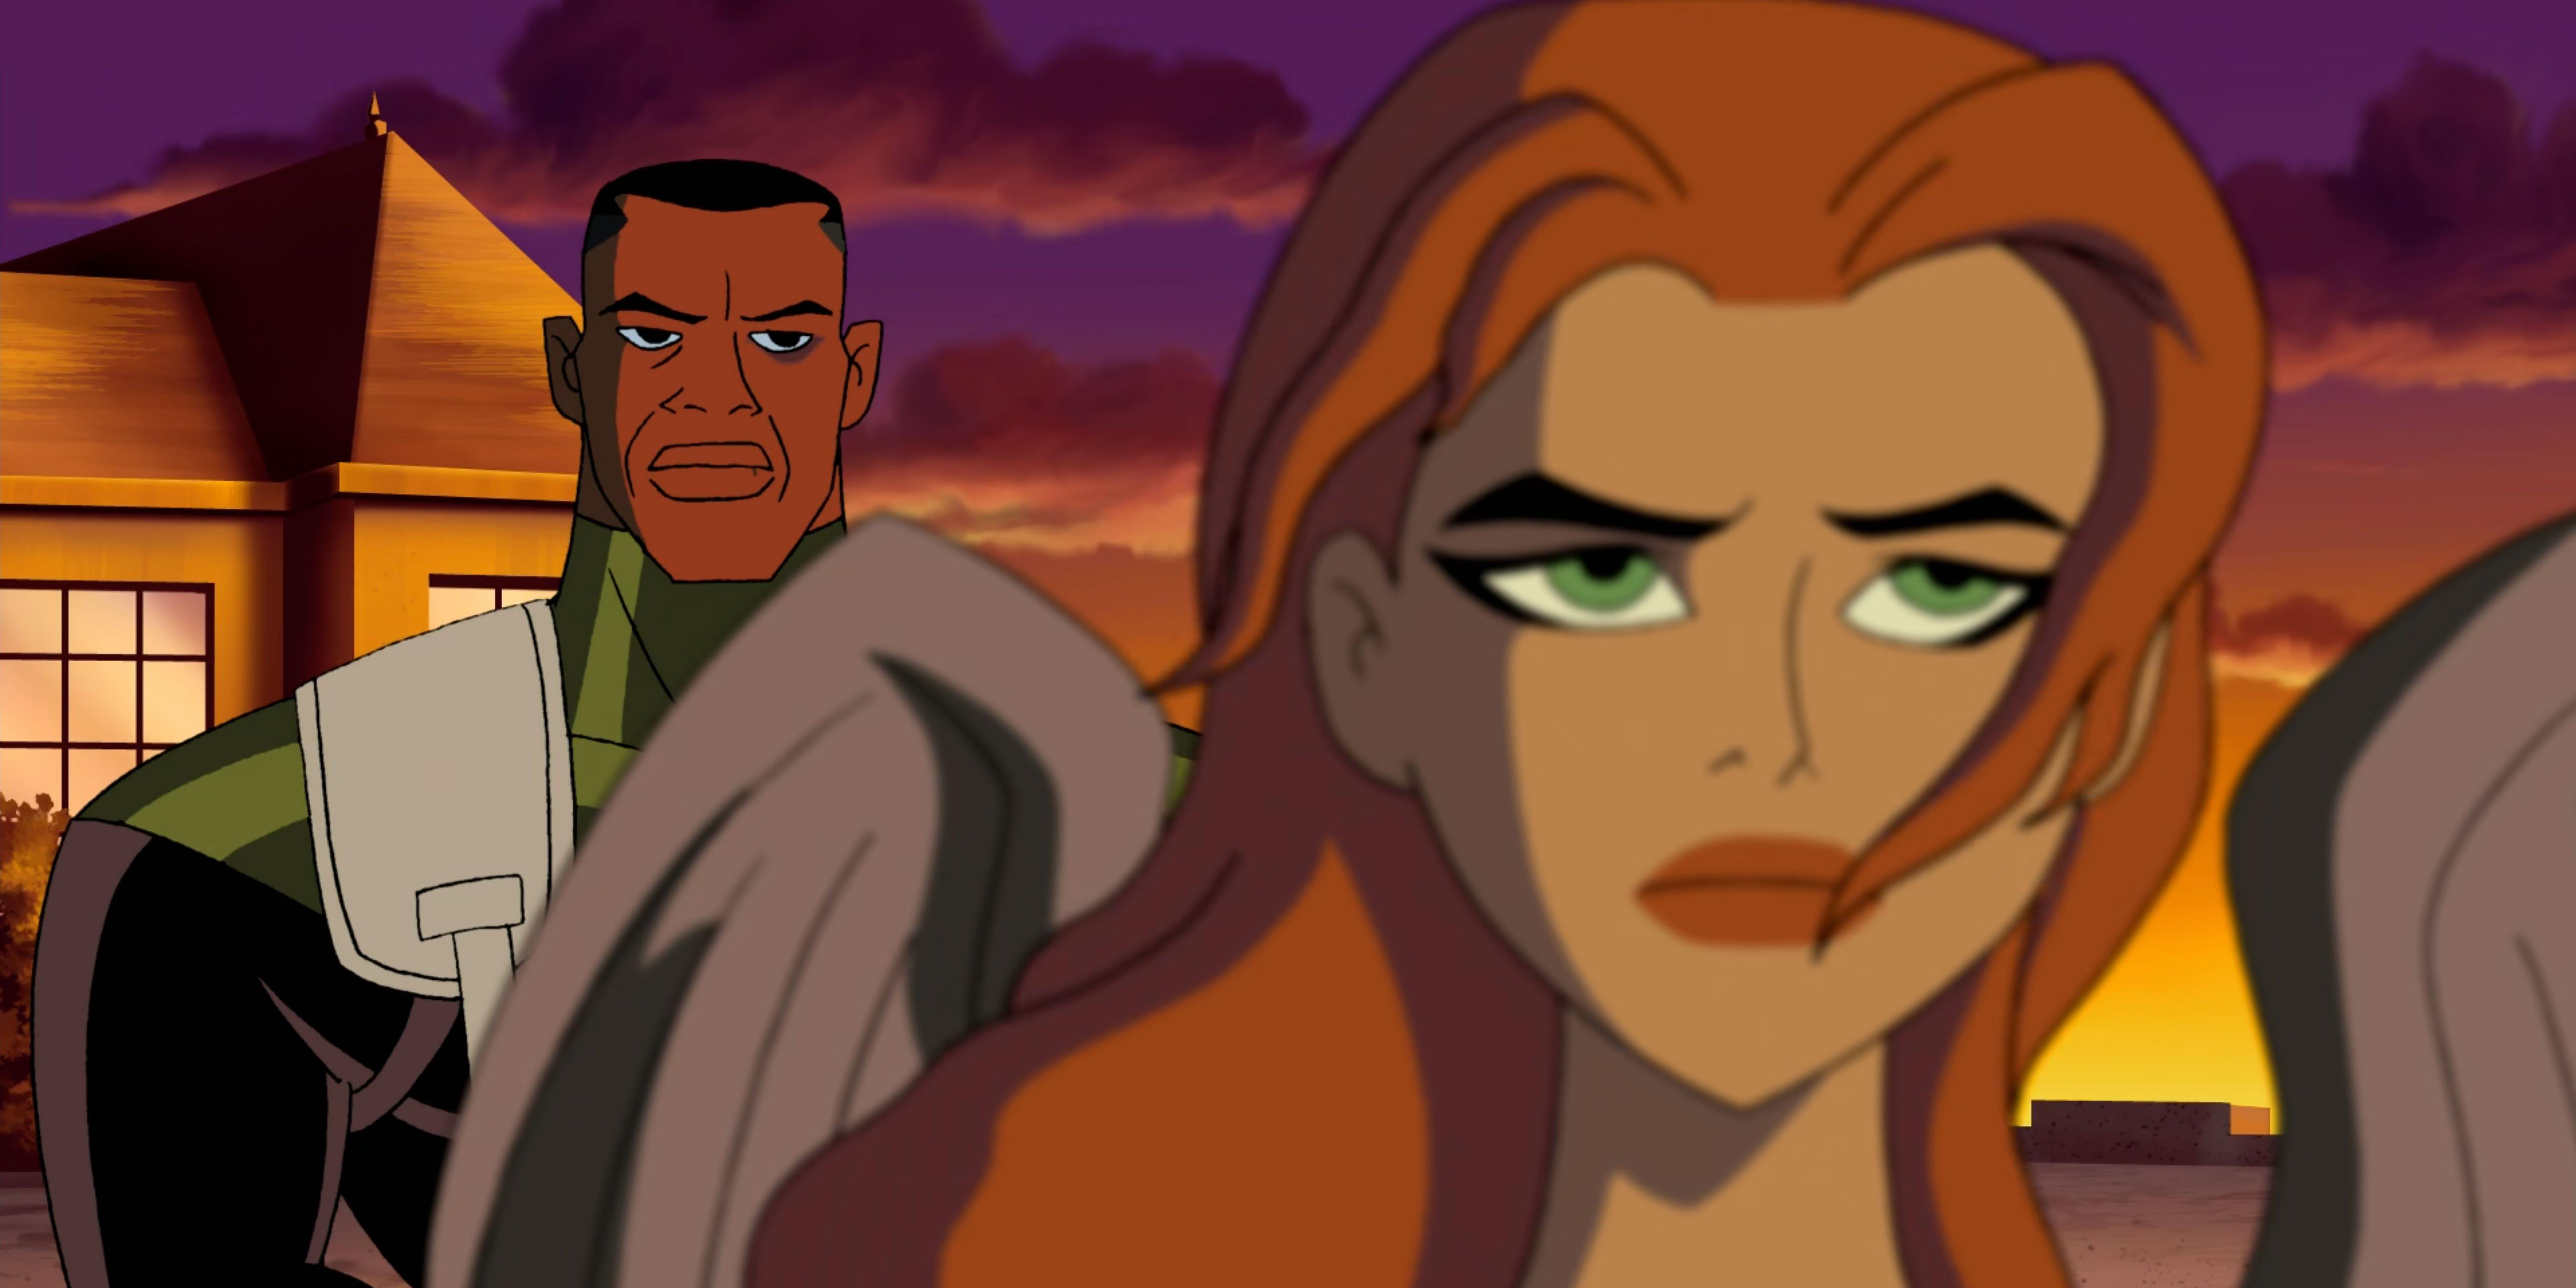 Green Lantern looks on at Hawkgirl.